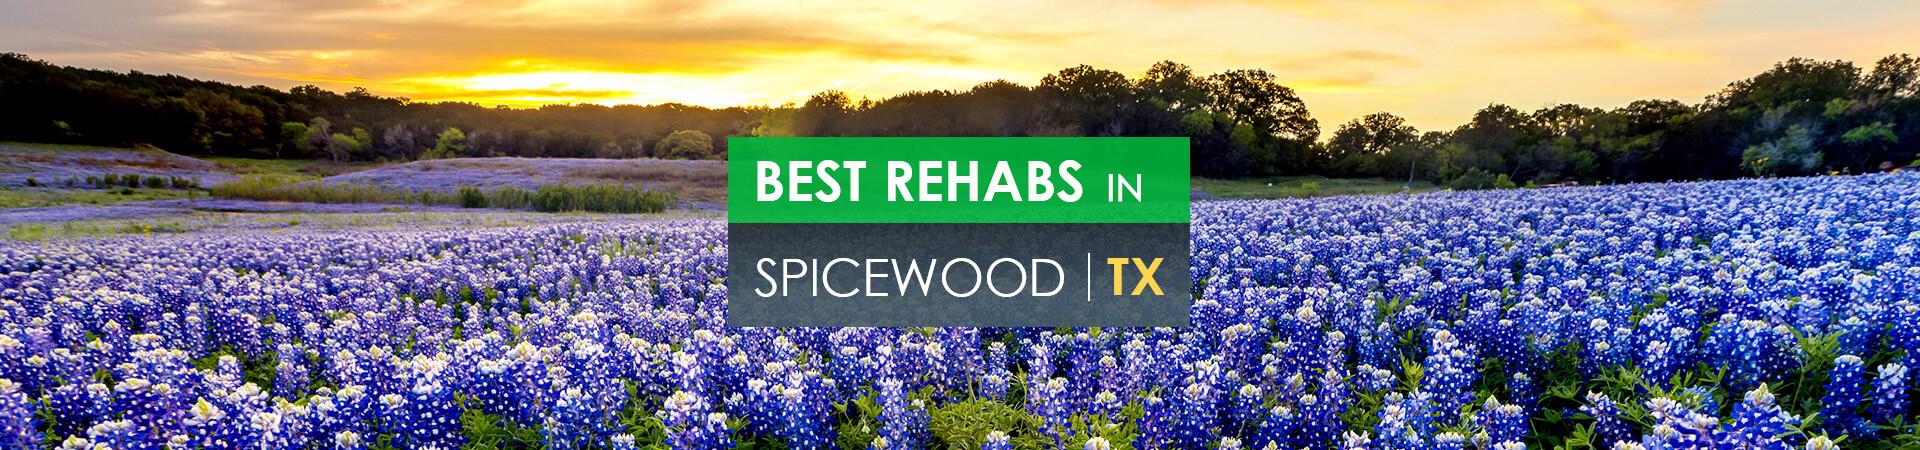 Best rehabs in Spicewood, TX